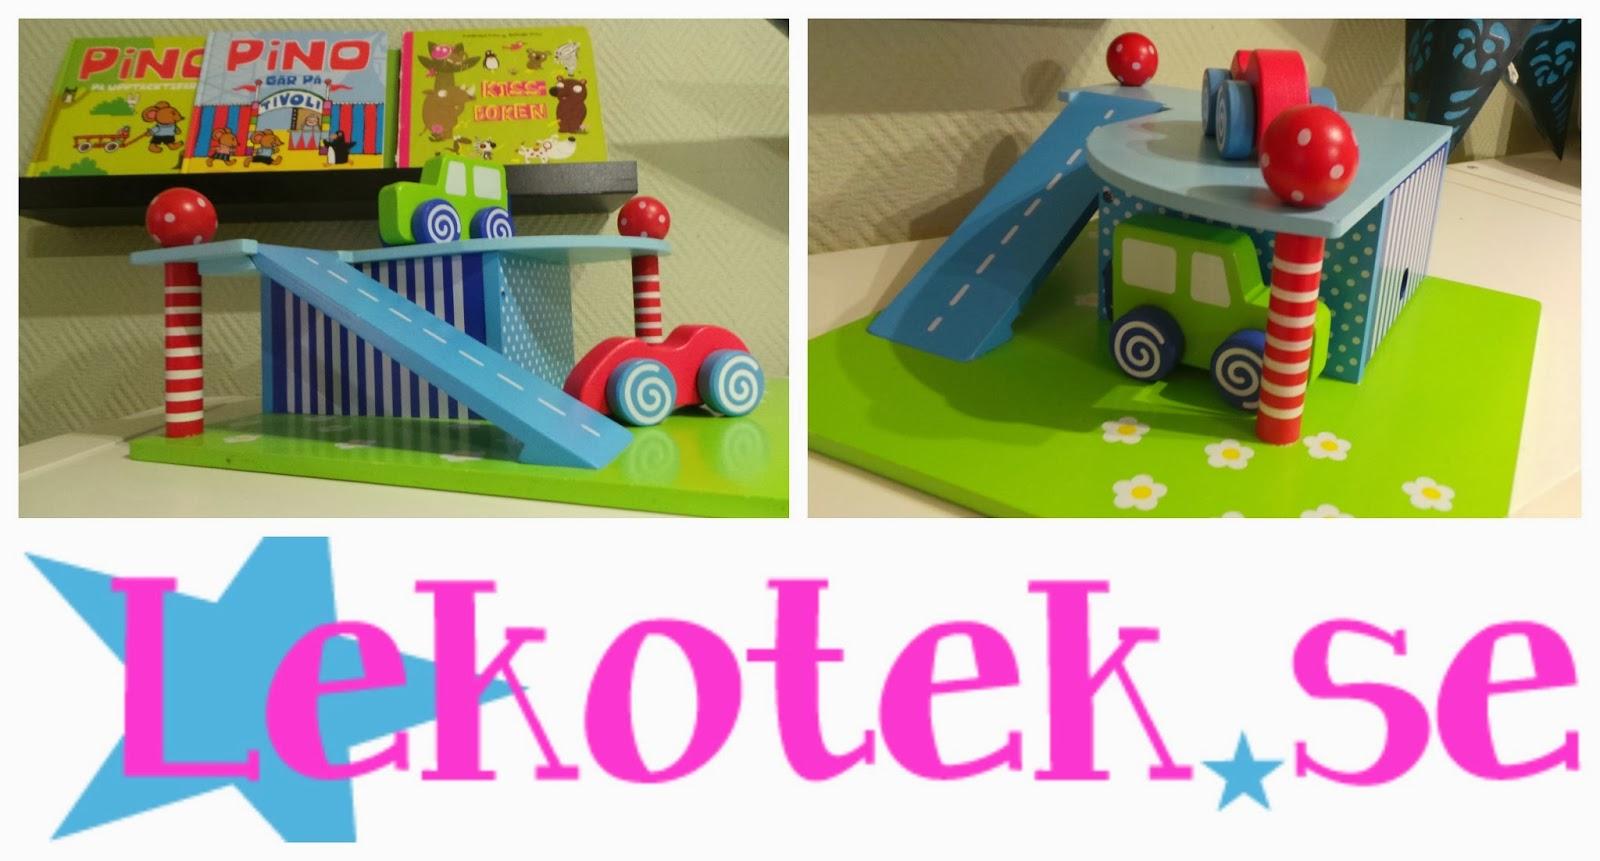 http://www.lekotek.se/